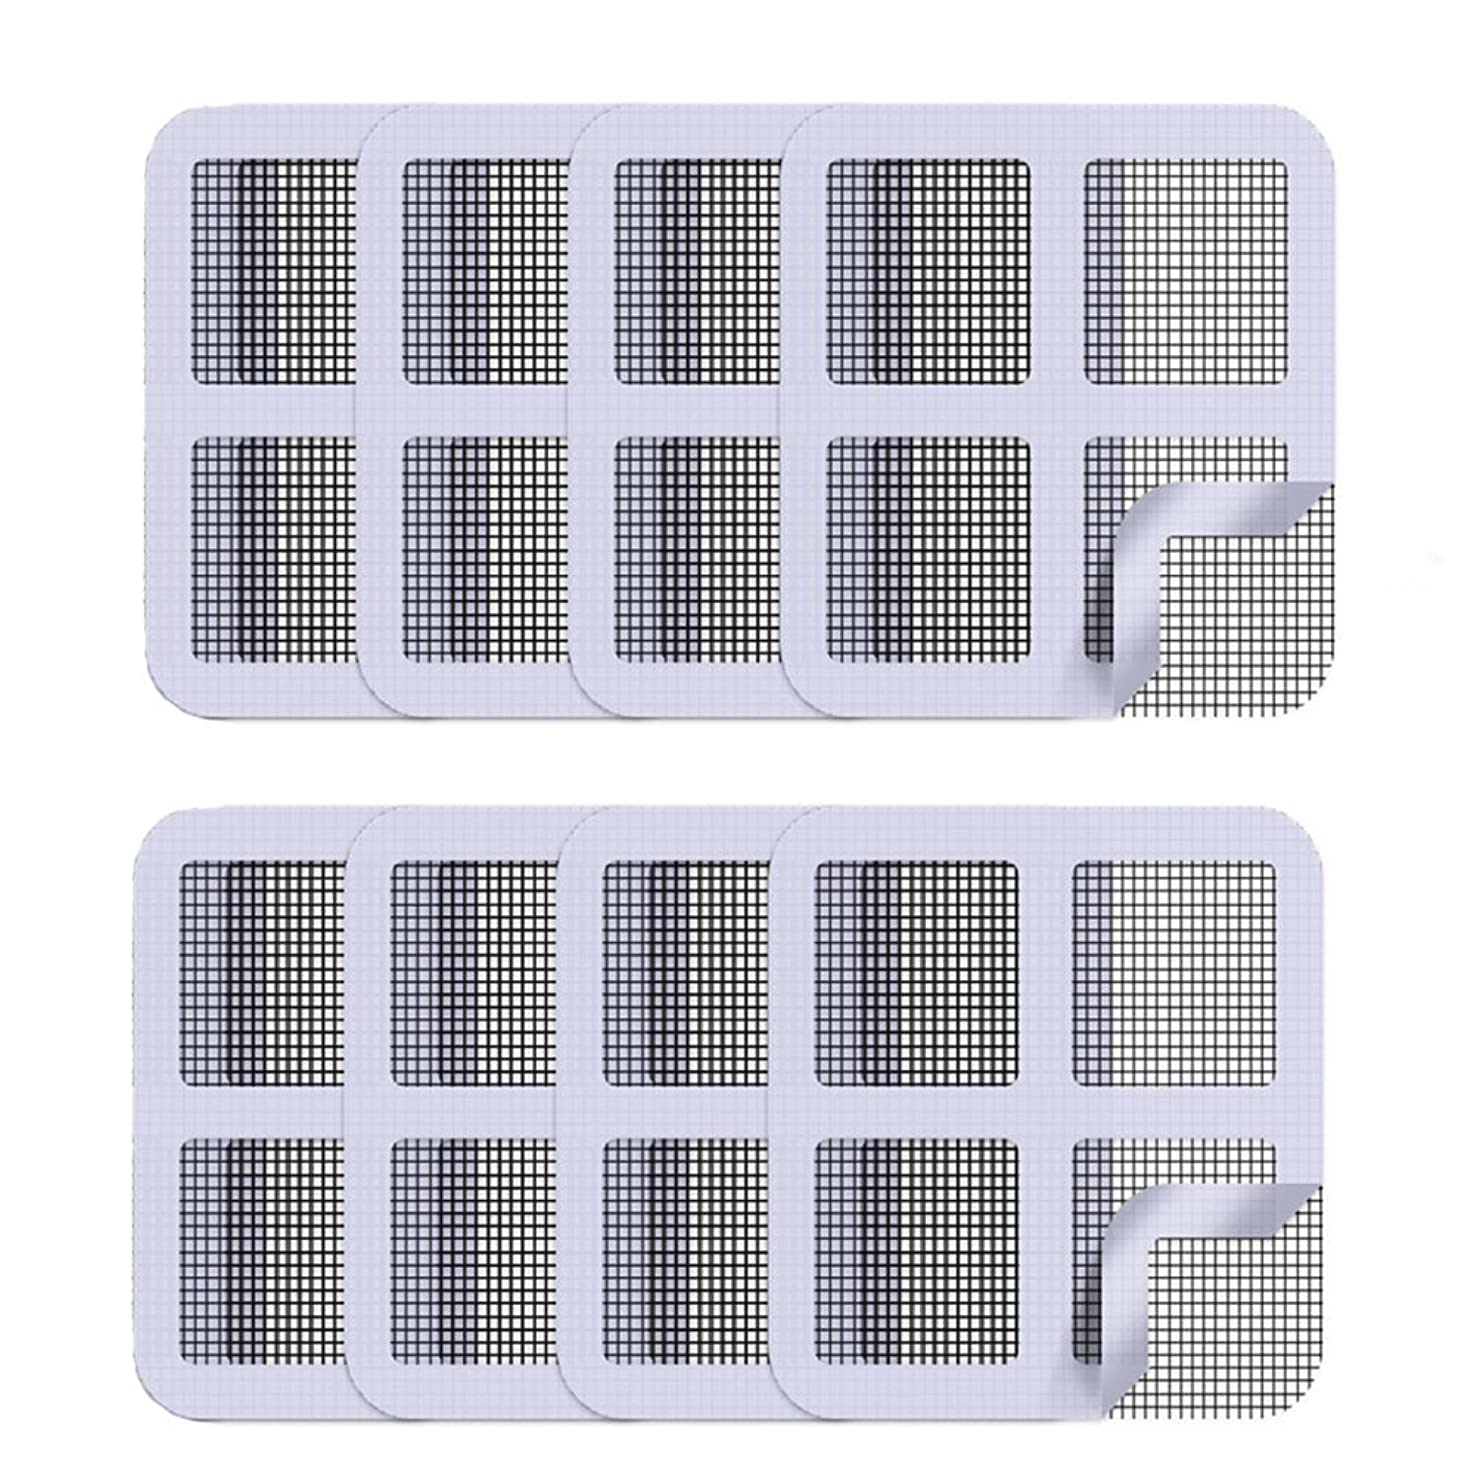 Window and Door Screen Repair Patch, Adhesive Repair Kit for Covering up Holes (Grey 8 pack)